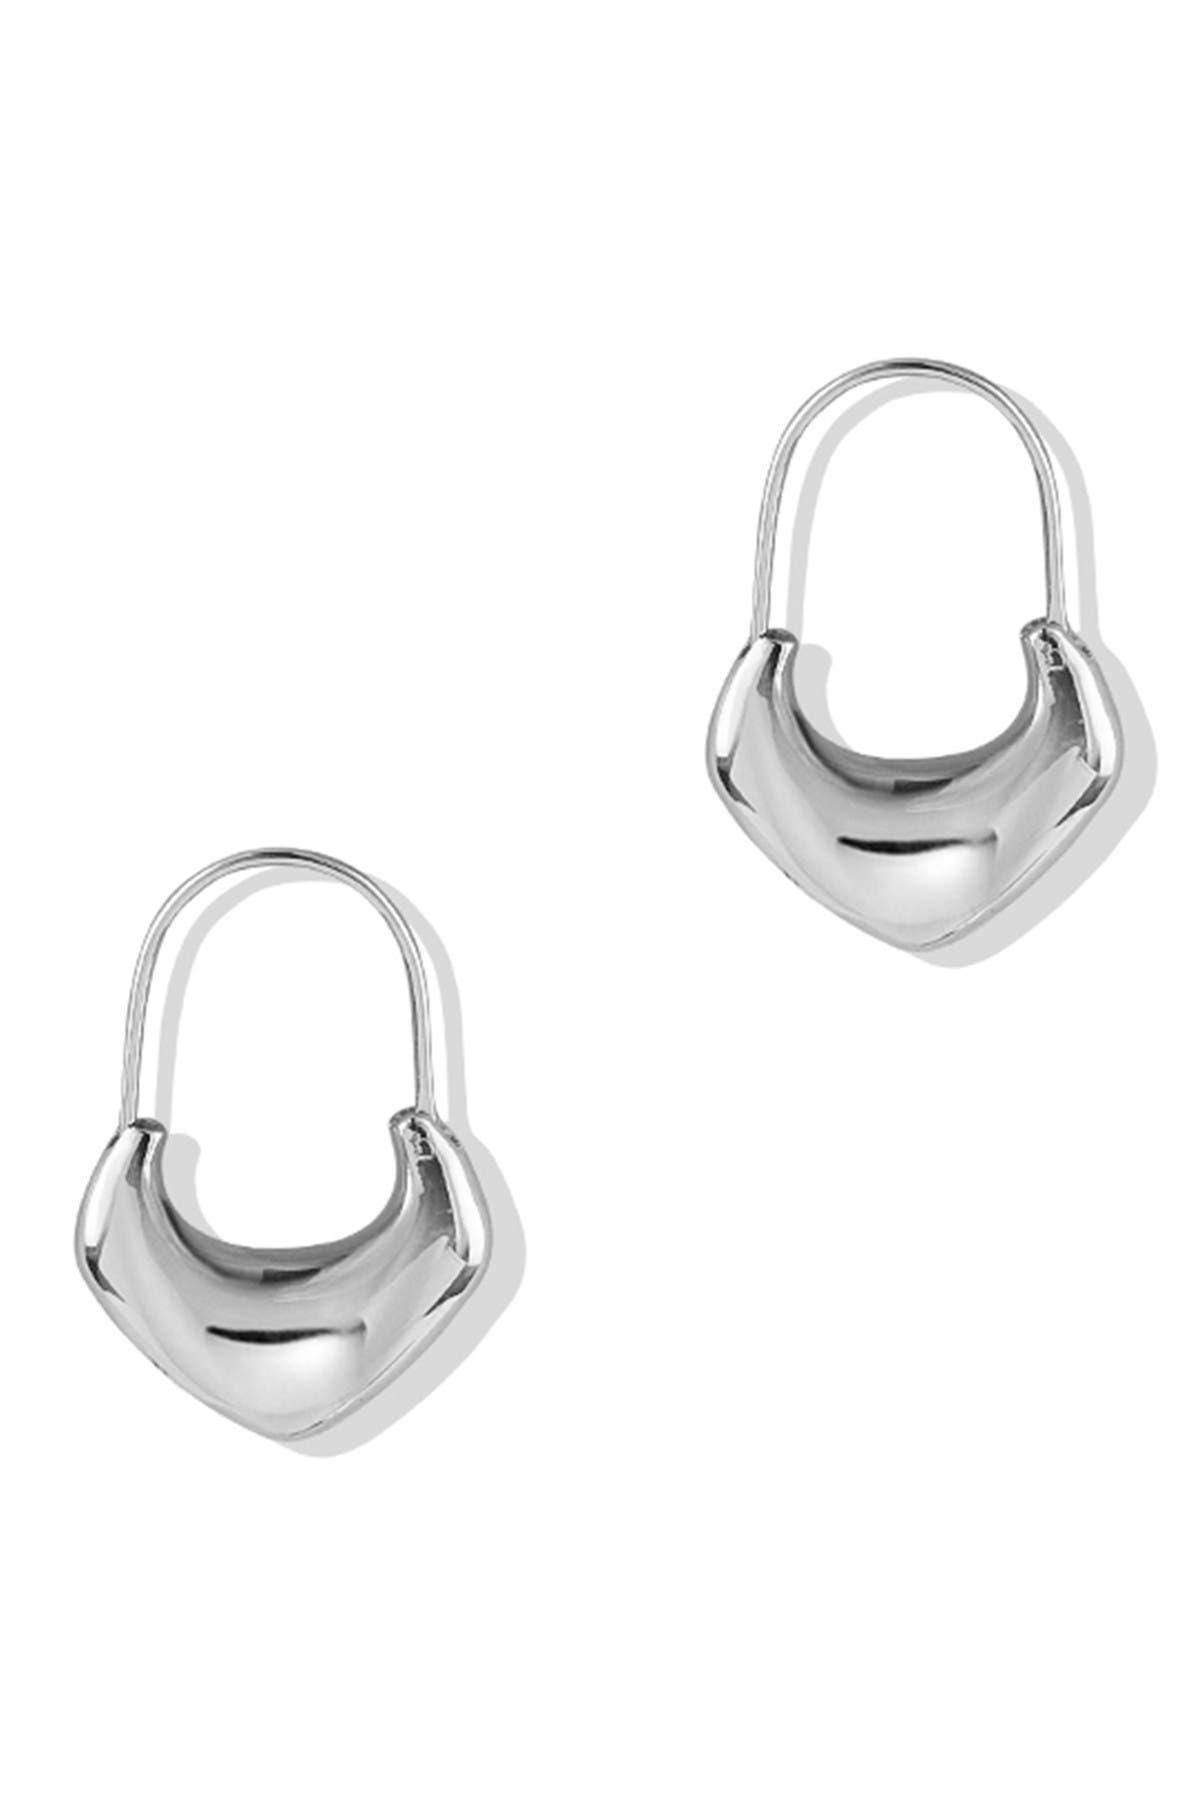 Image of Argento Vivo Sterling Silver Puff Chevron Hoop Earrings